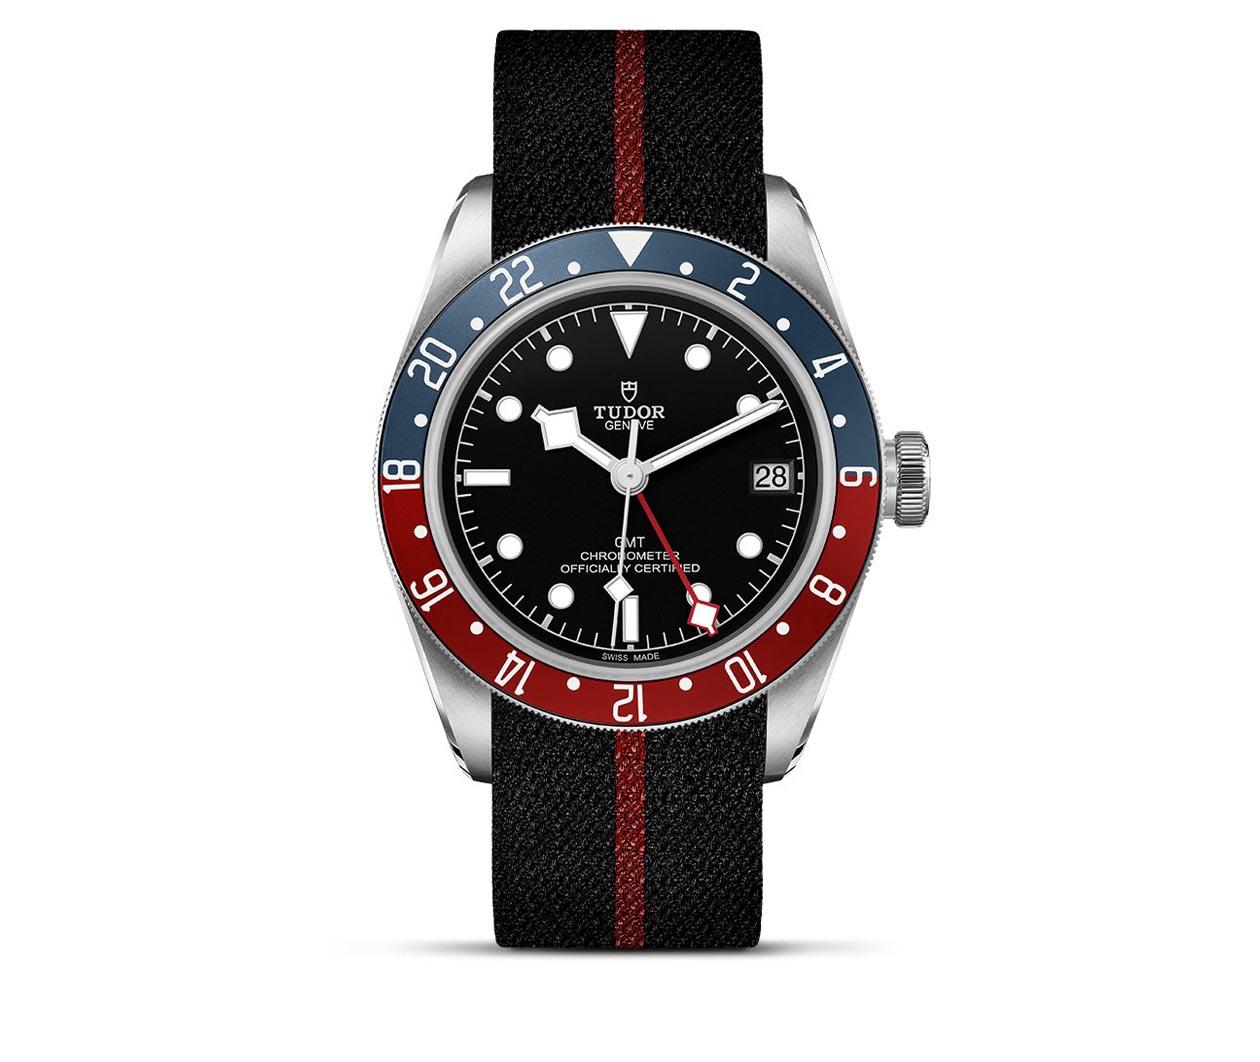 TUDOR Black Bay GMT M79830RB 0003 FINAL